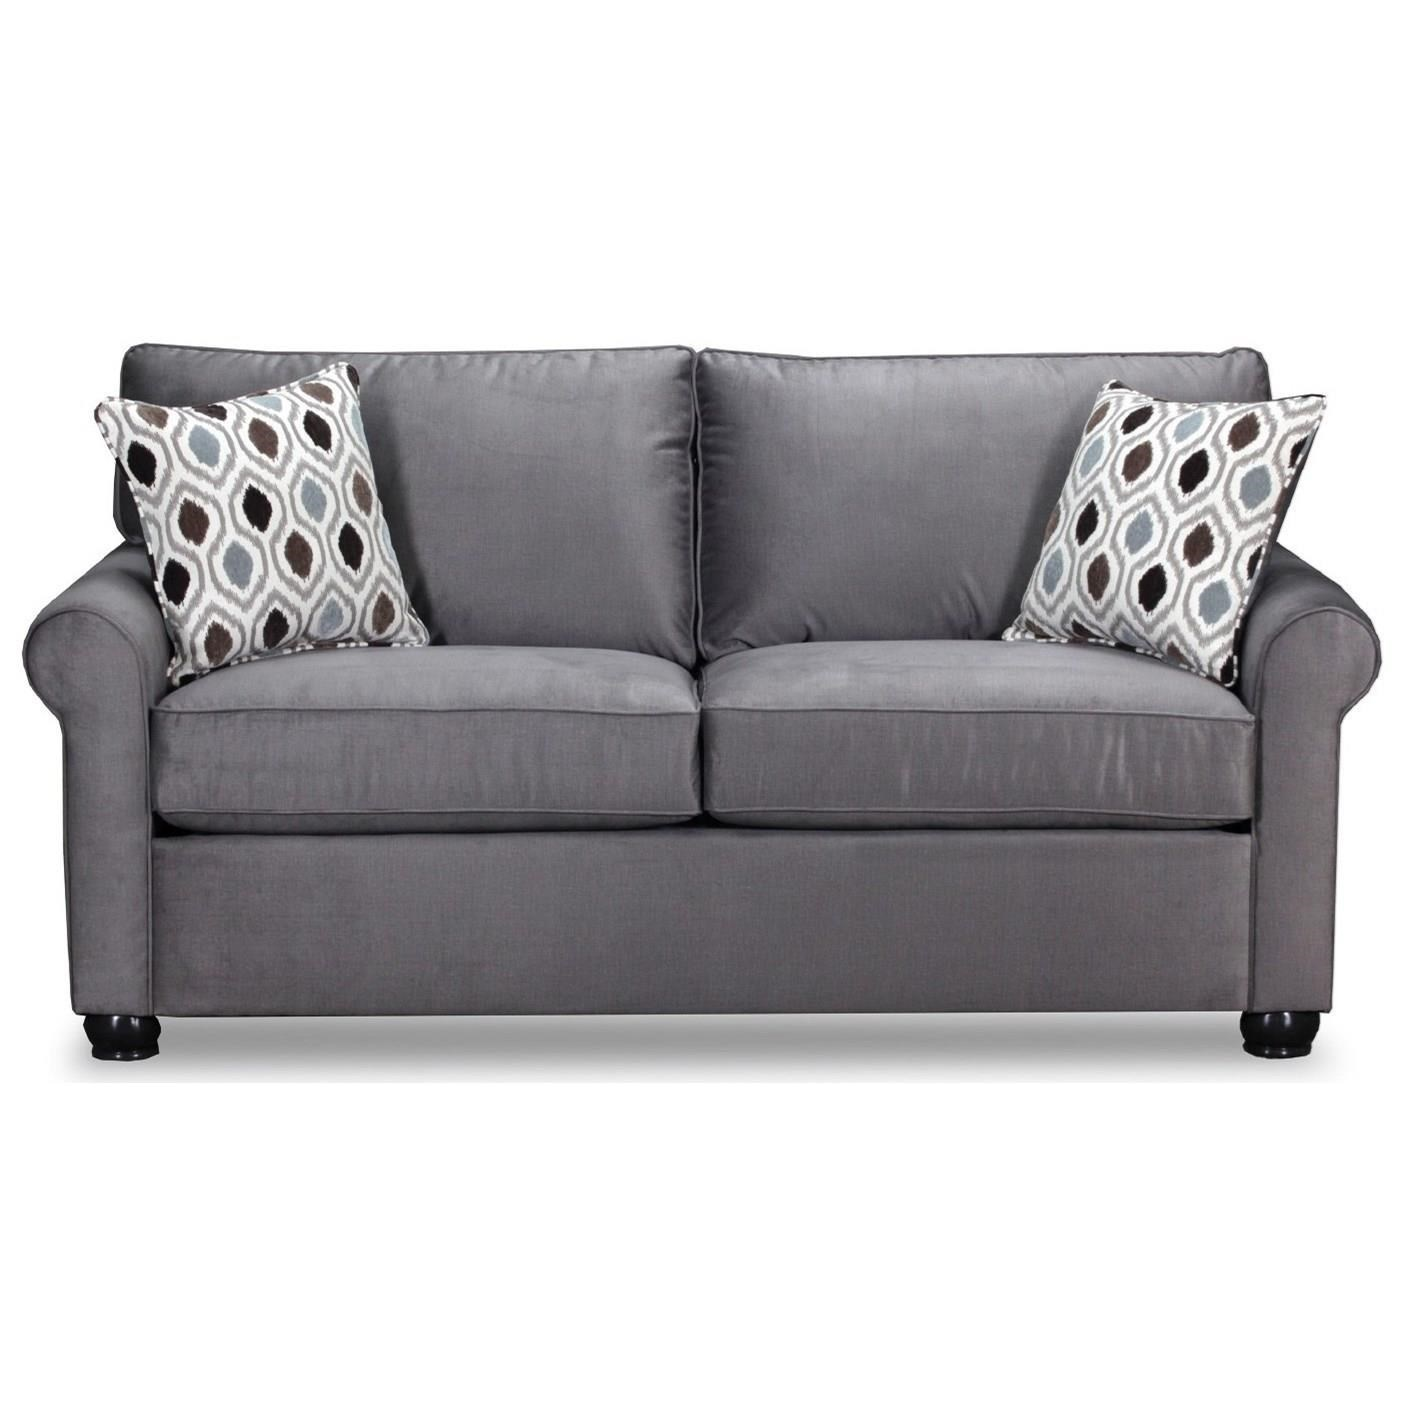 "1530 77"" Full Sleeper Sofa by Lane at Story & Lee Furniture"